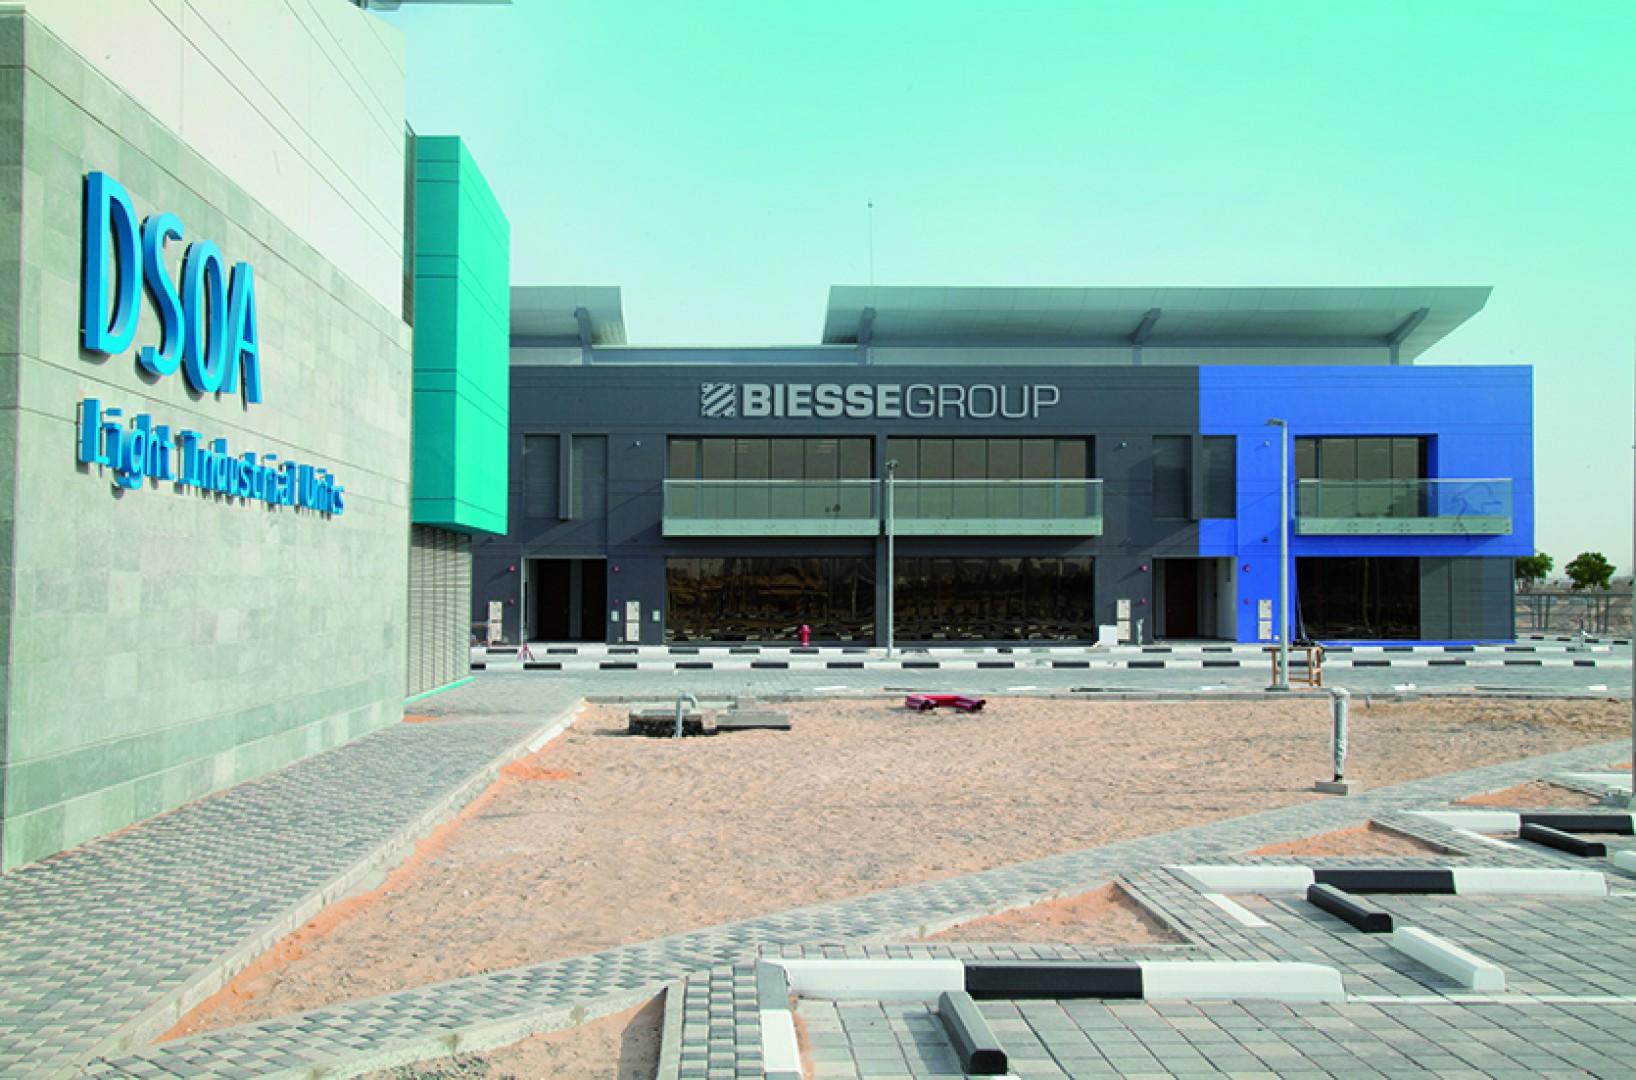 Campus Grupy Biesse w Dubaju. Fot. Grupa Biesse